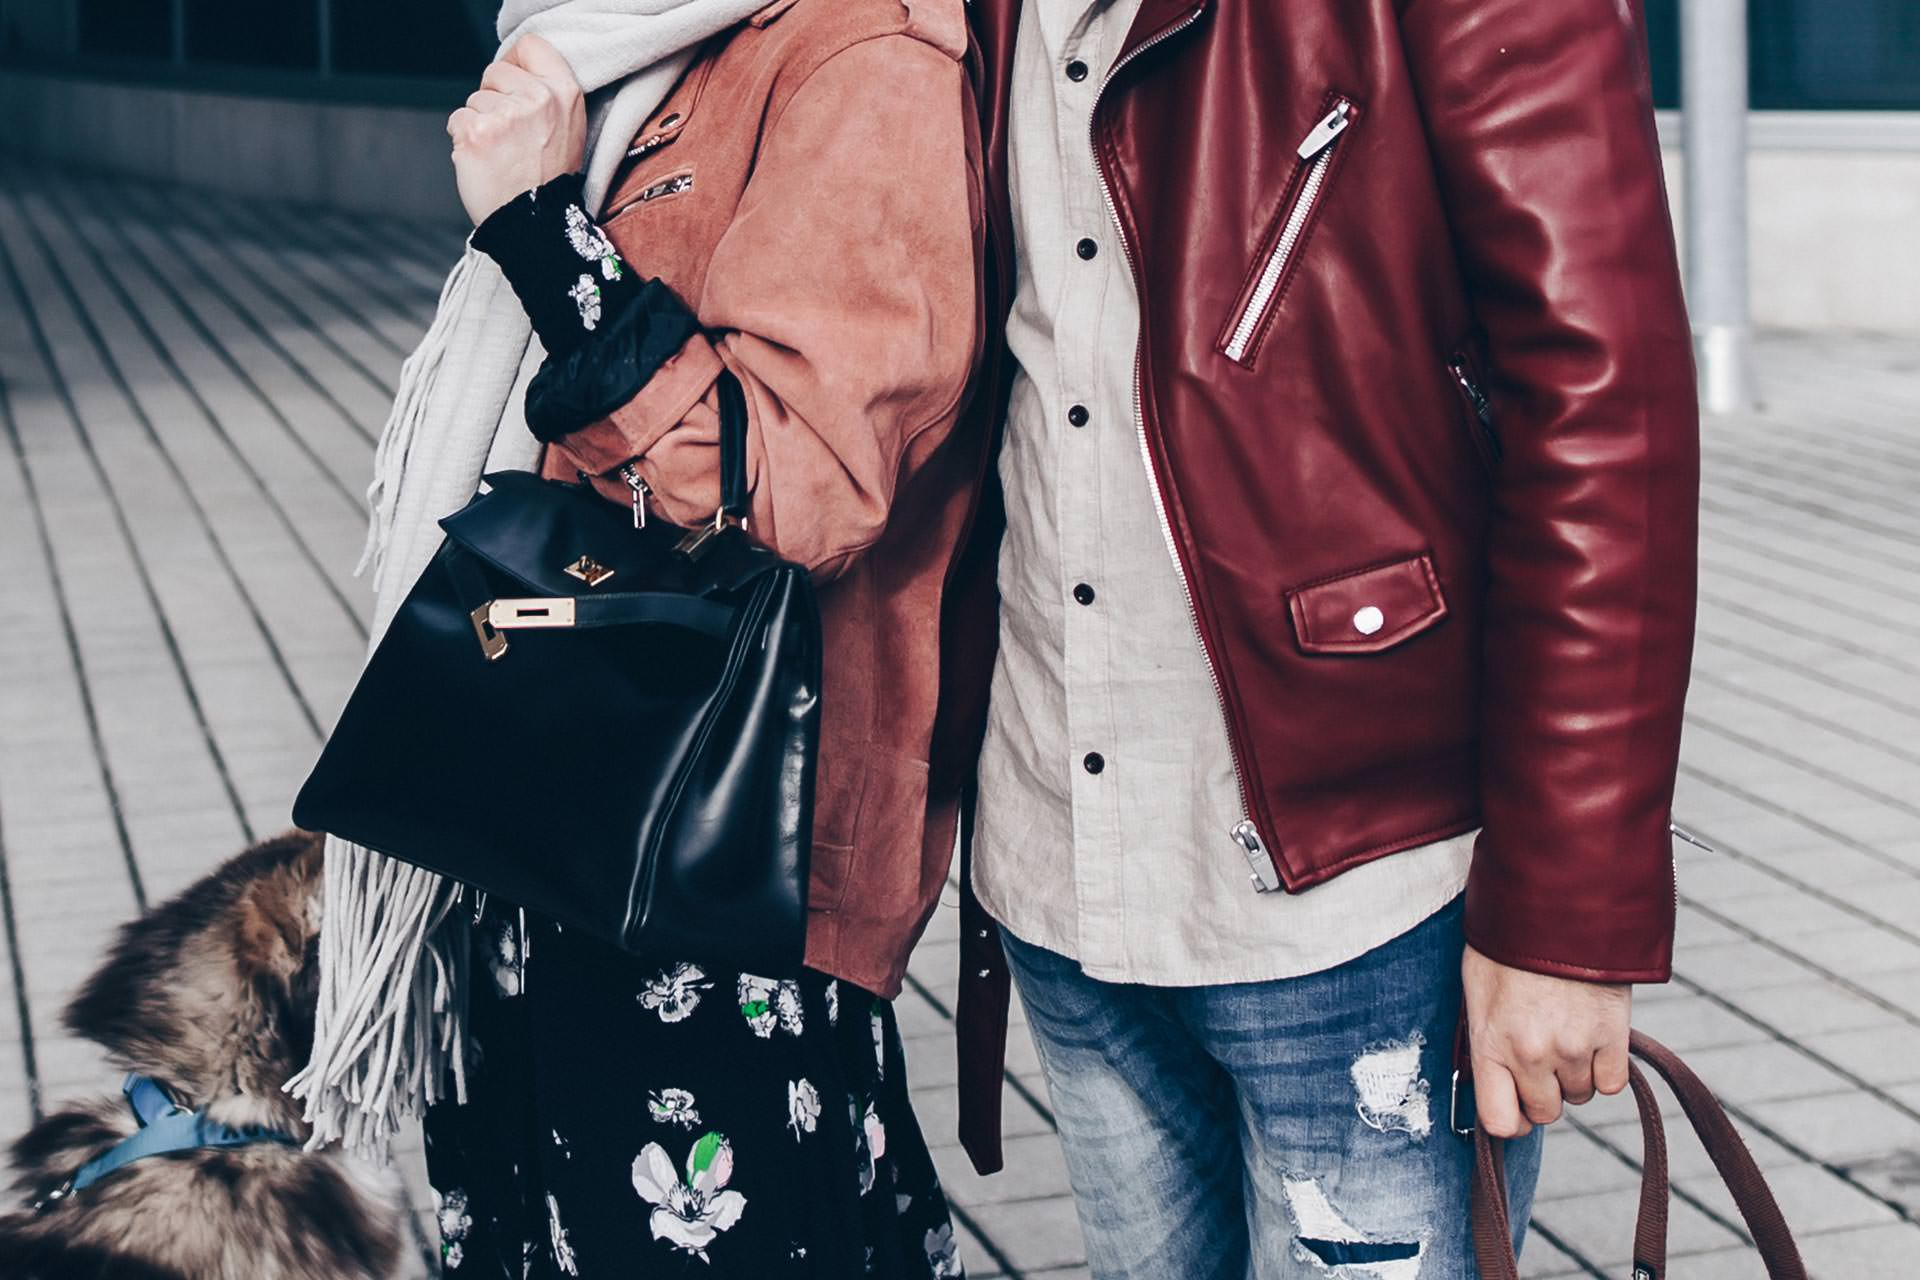 Paar Outfit, Pärchen Outfits, Winter Outfits mit Lederjacke, Lederjacke im Winter kombinieren, Valentino Rockstud Sneakers, Hermes Kelly Bag, Vintage Bag, Streetstyle, Midikleid im Winter, Fashion und Style Blog, Männerblog, Outfits Blog, www.whoismocca.com